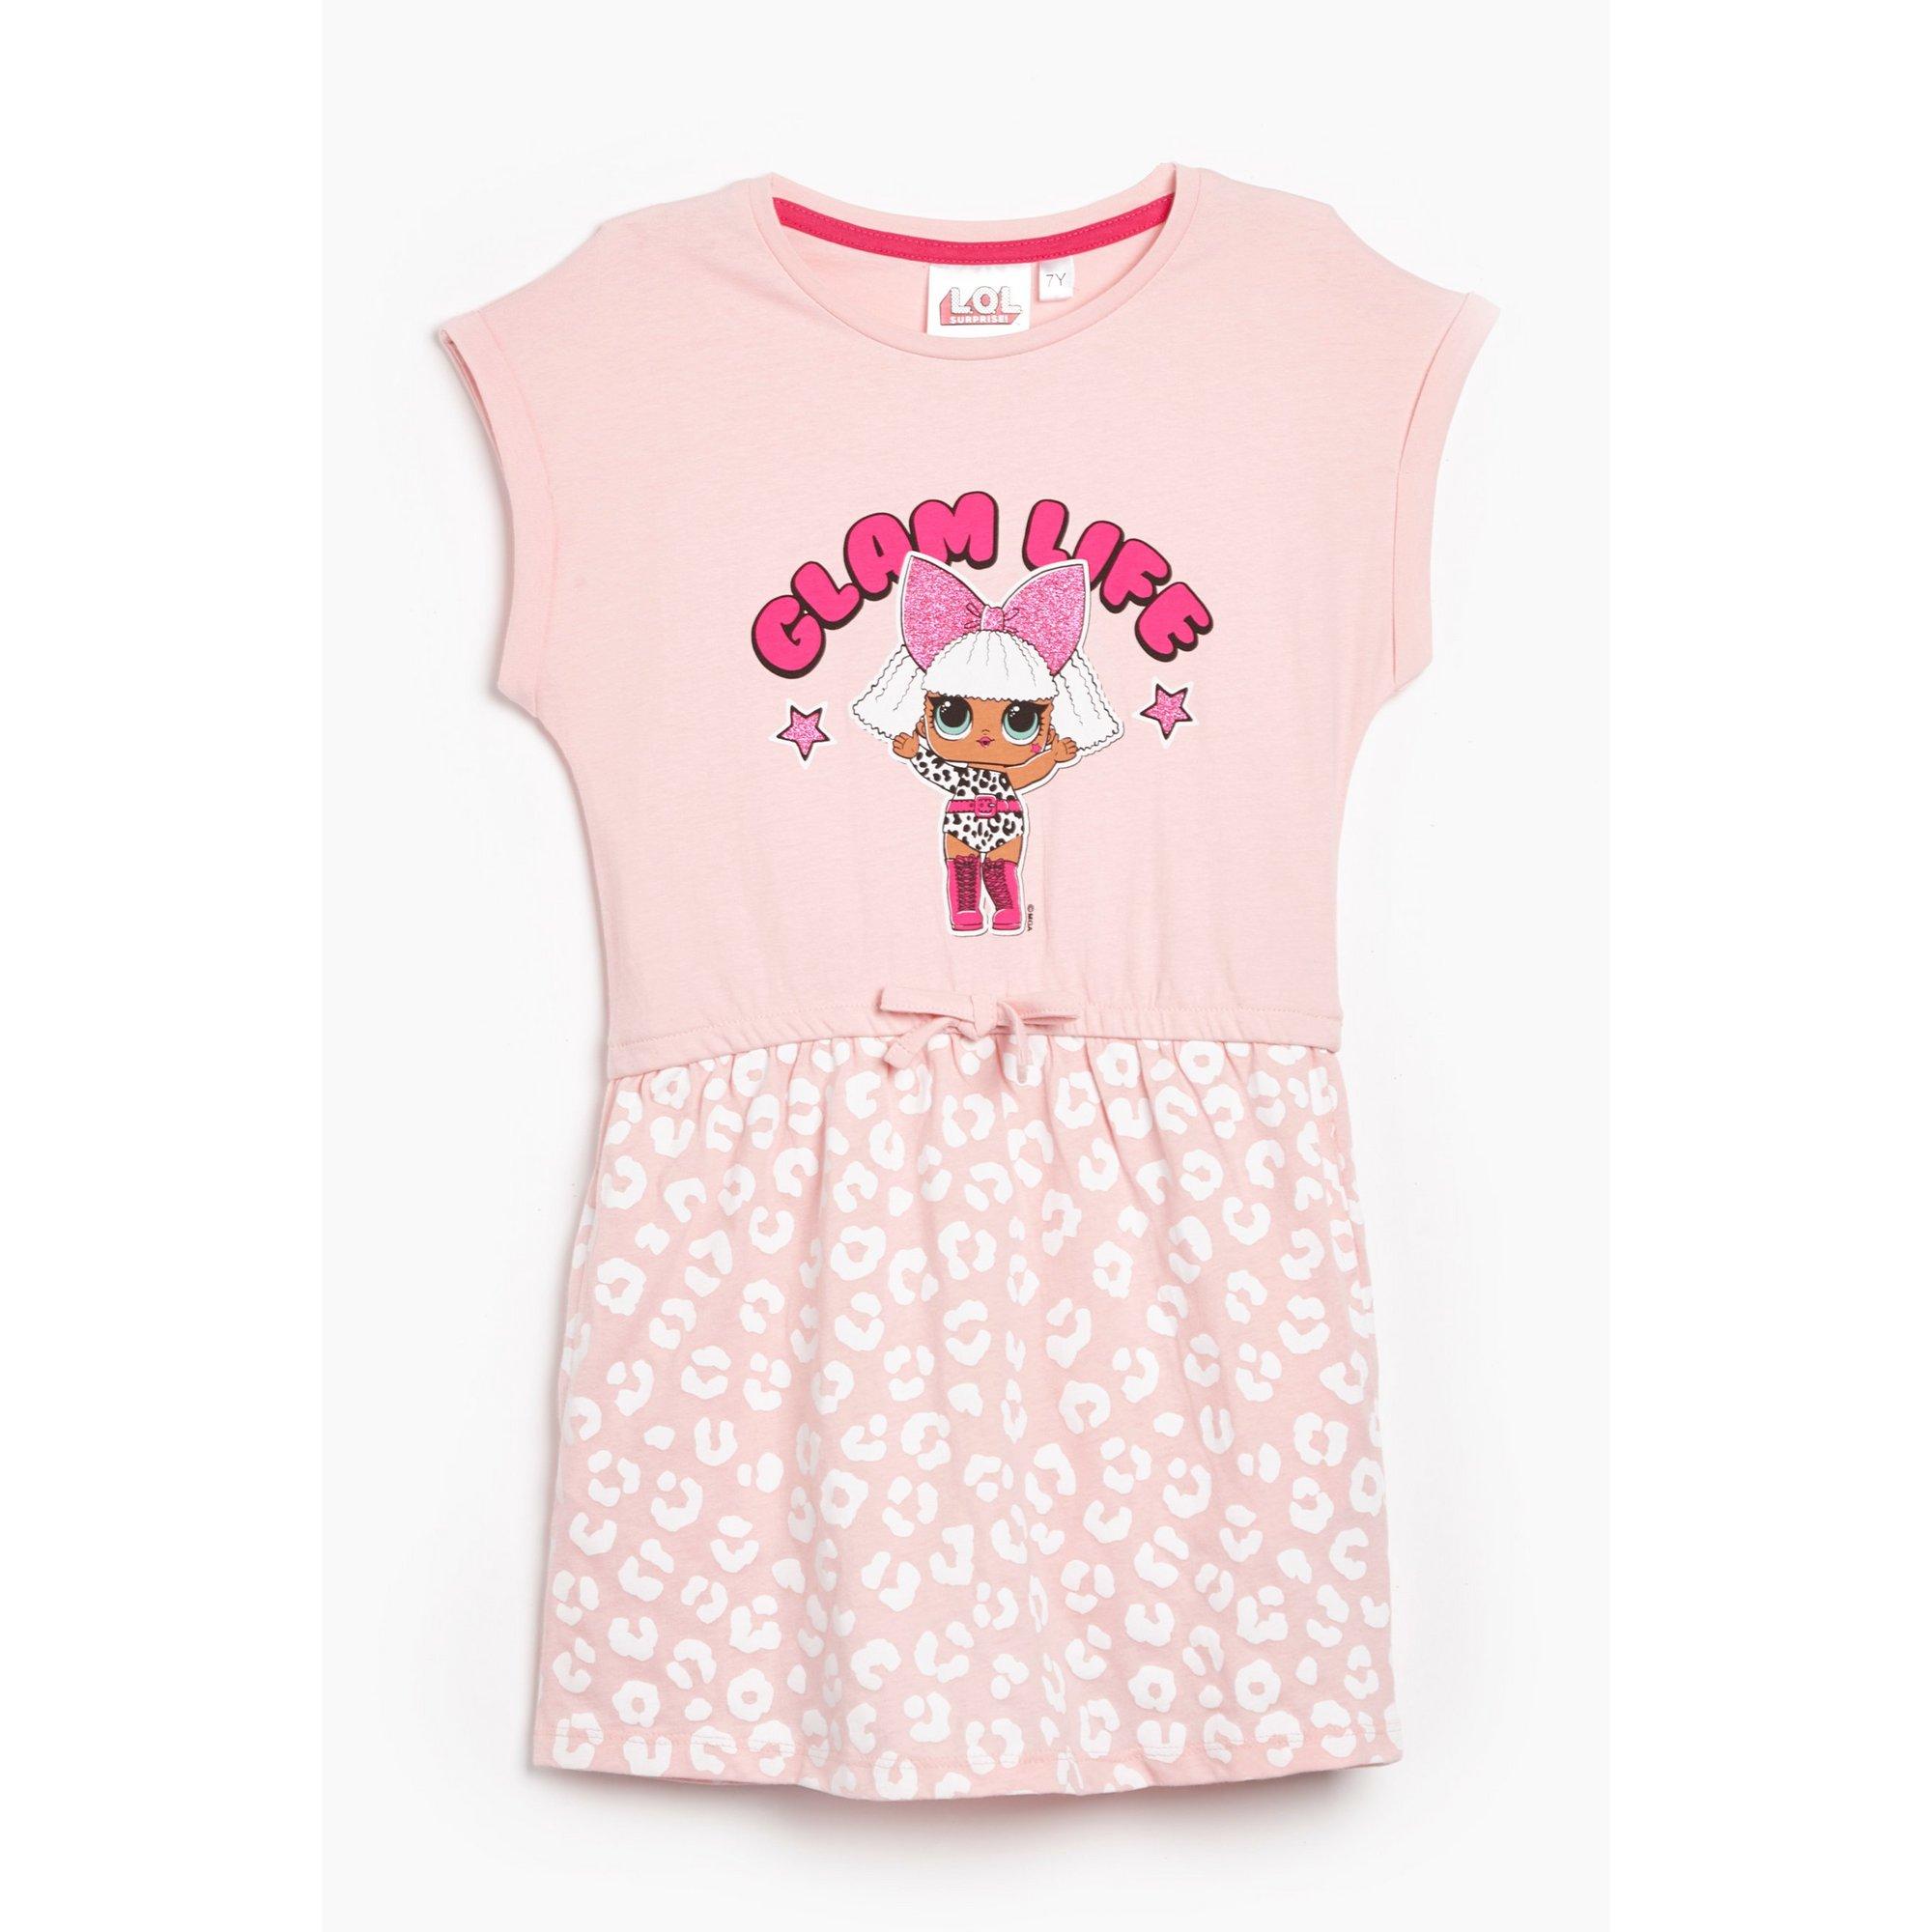 Image of Girls LOL Surprise Glam Life Short Sleeve Dress